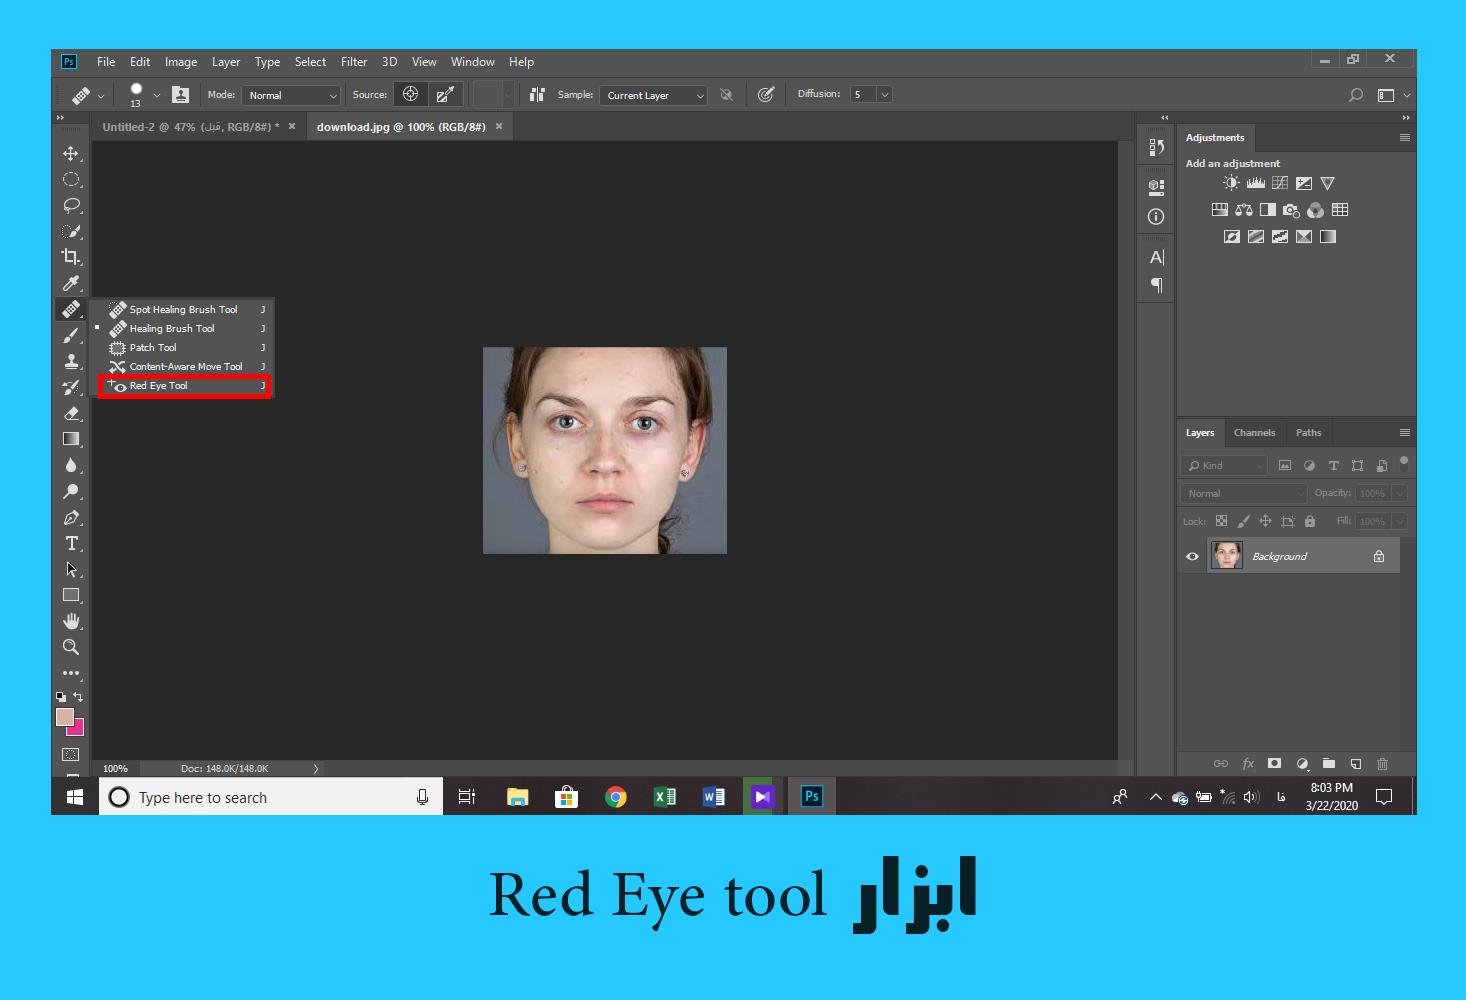 Red Eye tool یکی دیگر از ابزار روتوش عکس در فتوشاپ